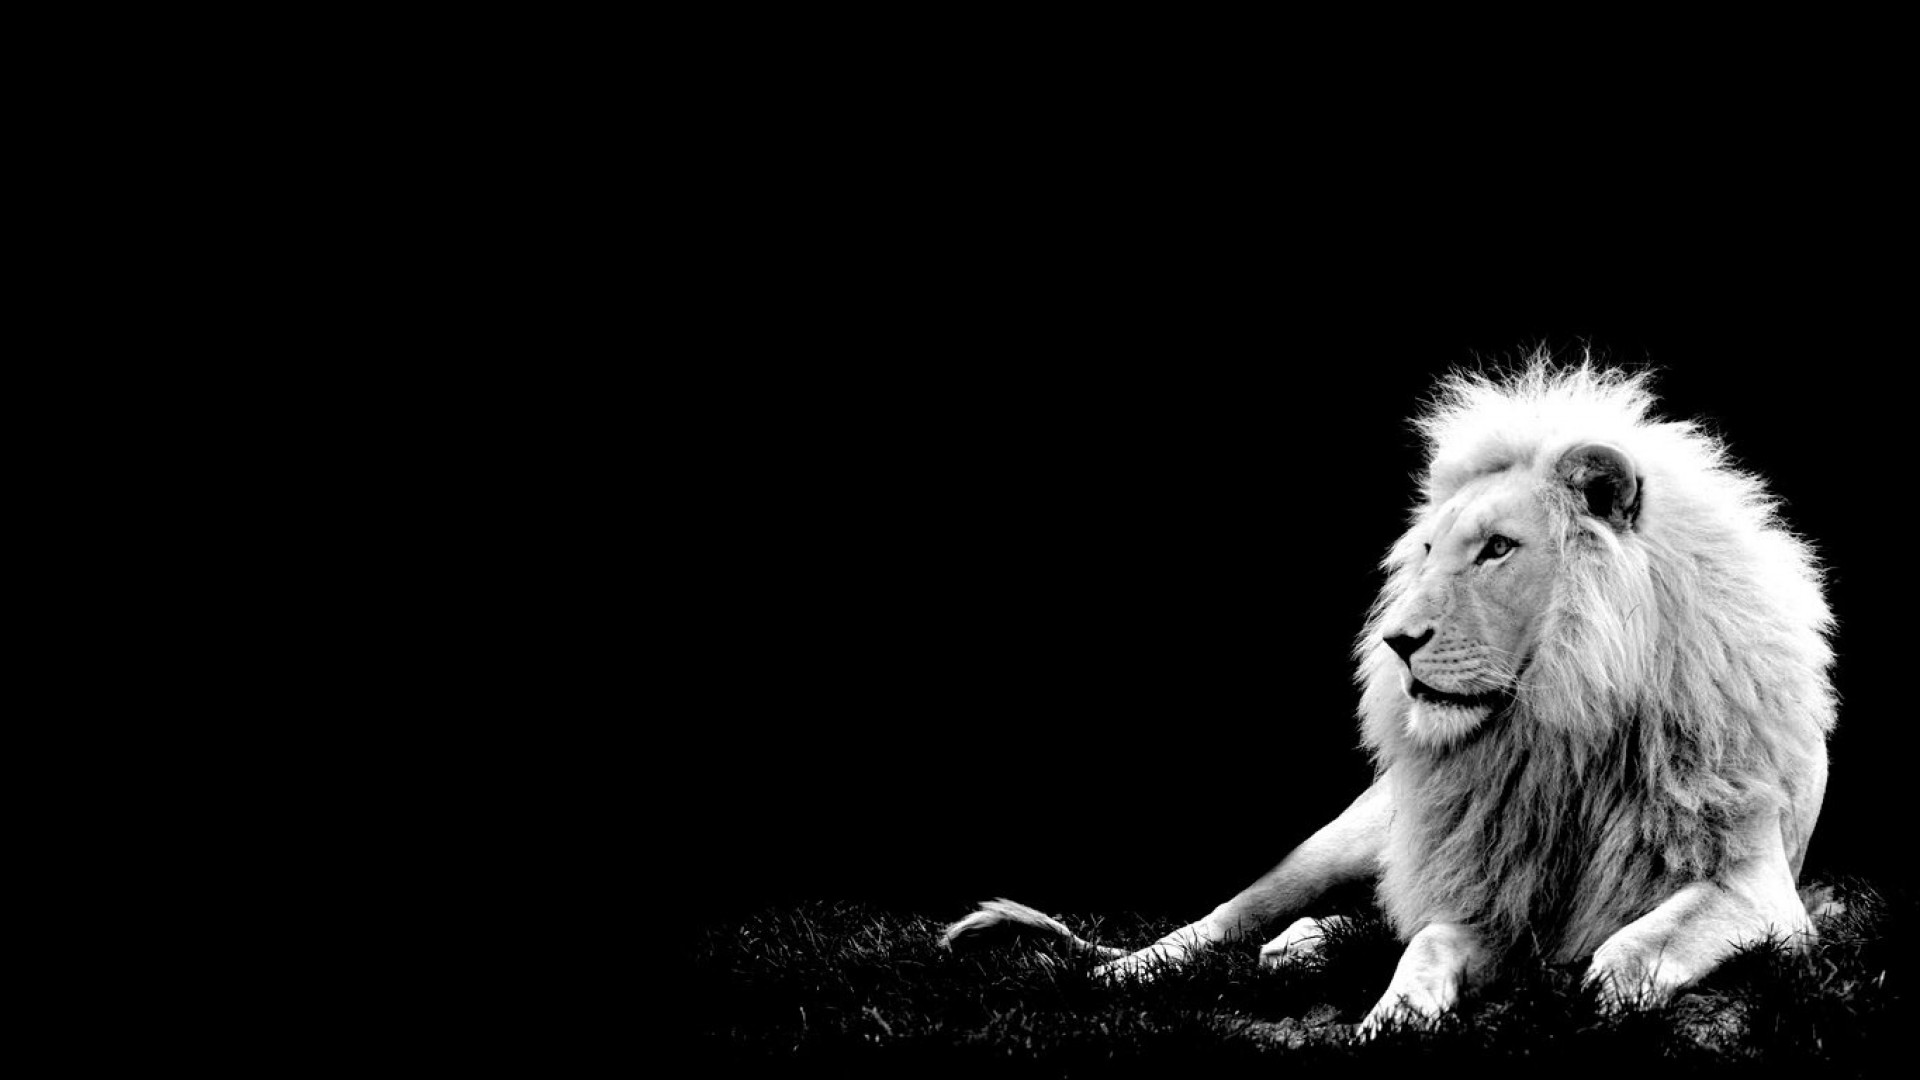 Lion Big Kucing Wallpaper Fanpop